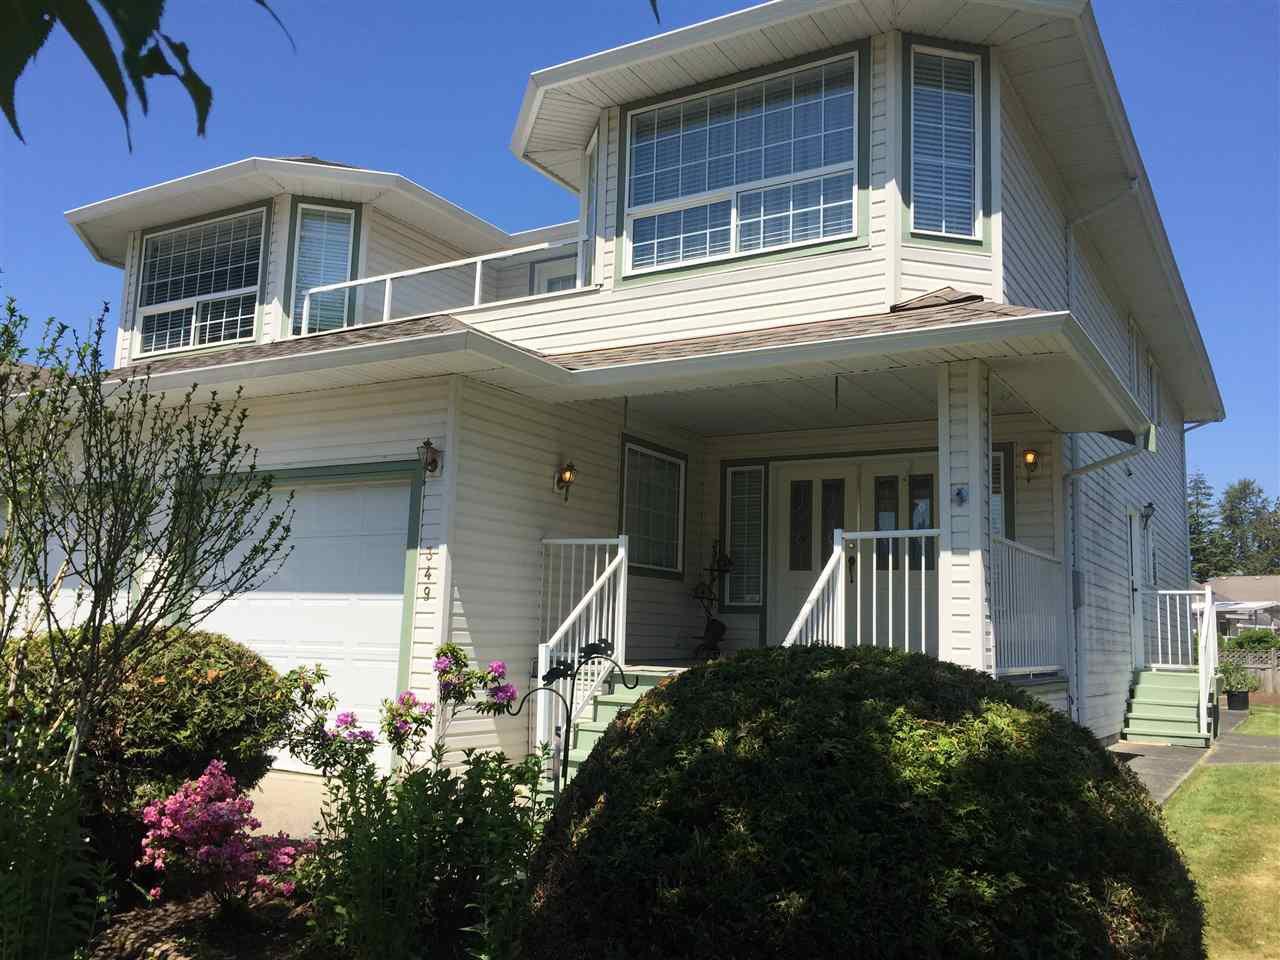 Main Photo: 349 CHESTNUT Avenue: Harrison Hot Springs House for sale : MLS®# R2376867